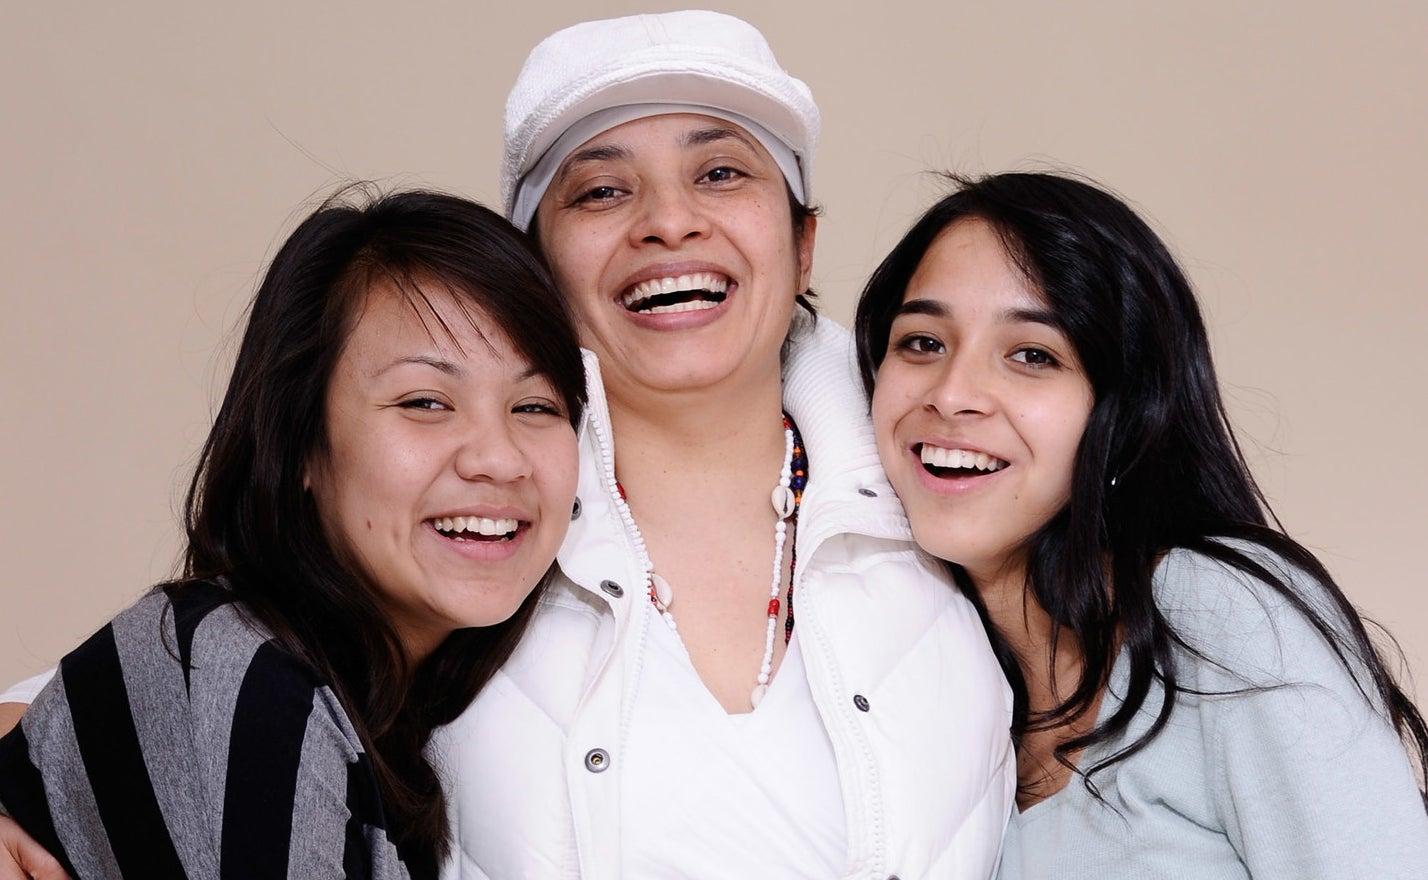 Writer-director Aurora Guerrero with the stars of Mosquita y Mari, Fenessa Pineda and Venecia Troncoso.